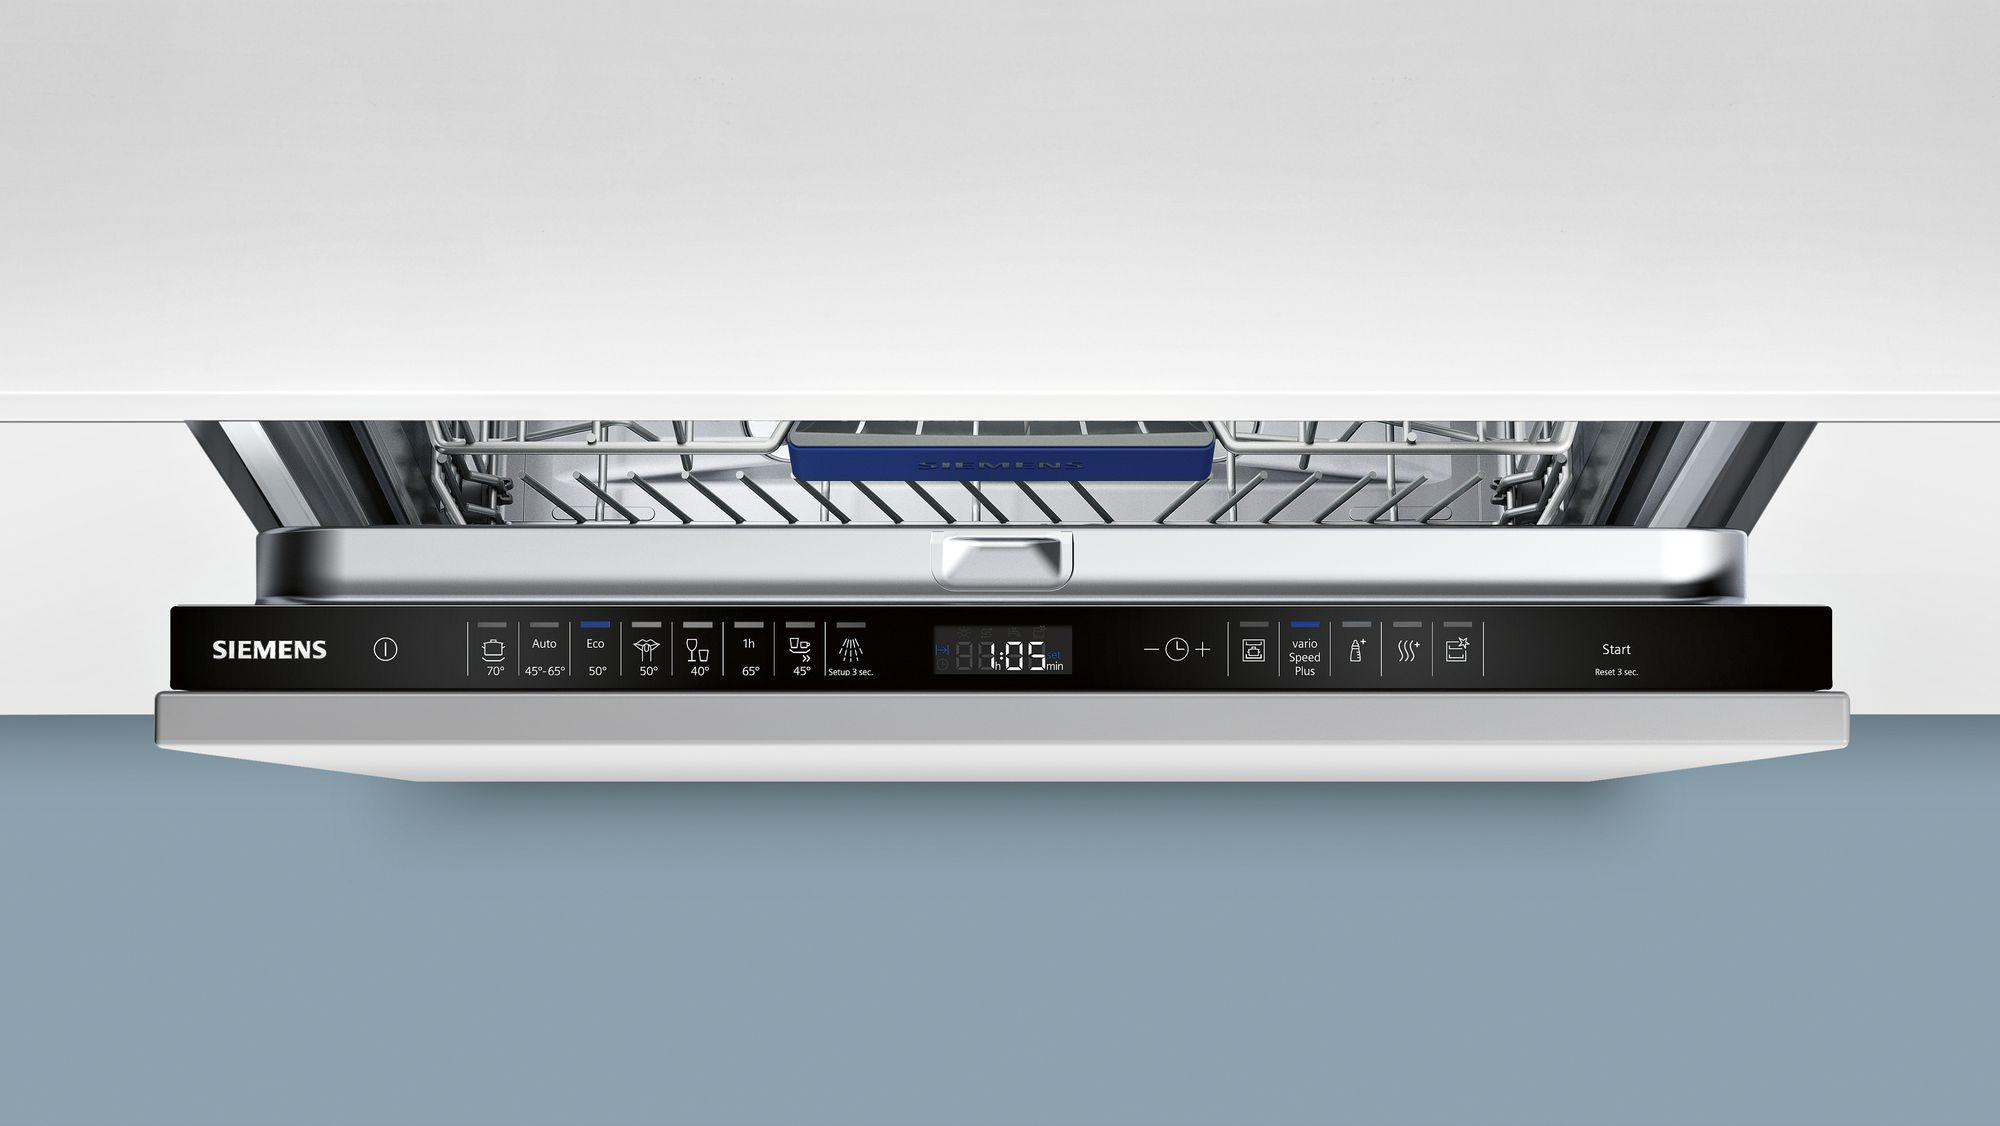 Lavastoviglie SIEMENS SN658D02ME da incasso su Brand-o Store